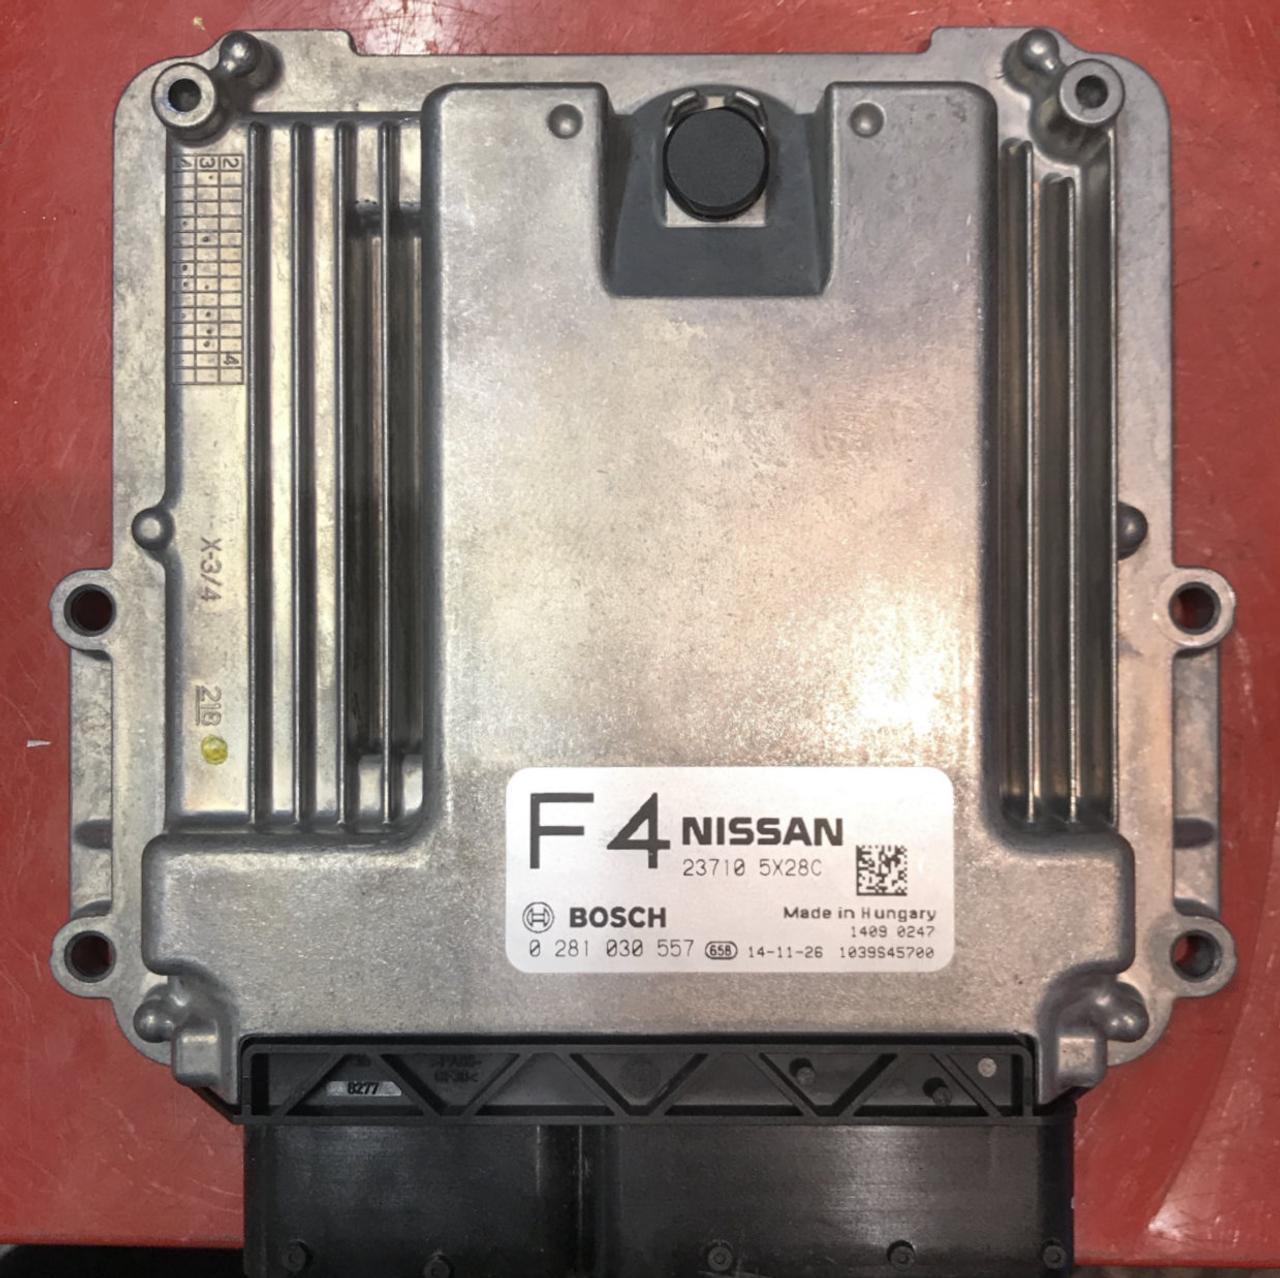 Plug & Play Bosch Engine ECU, Nissan Navara / Pathfinder 3 0 dCi,  0281030557, 0 281 030 557, 23710 5X28C